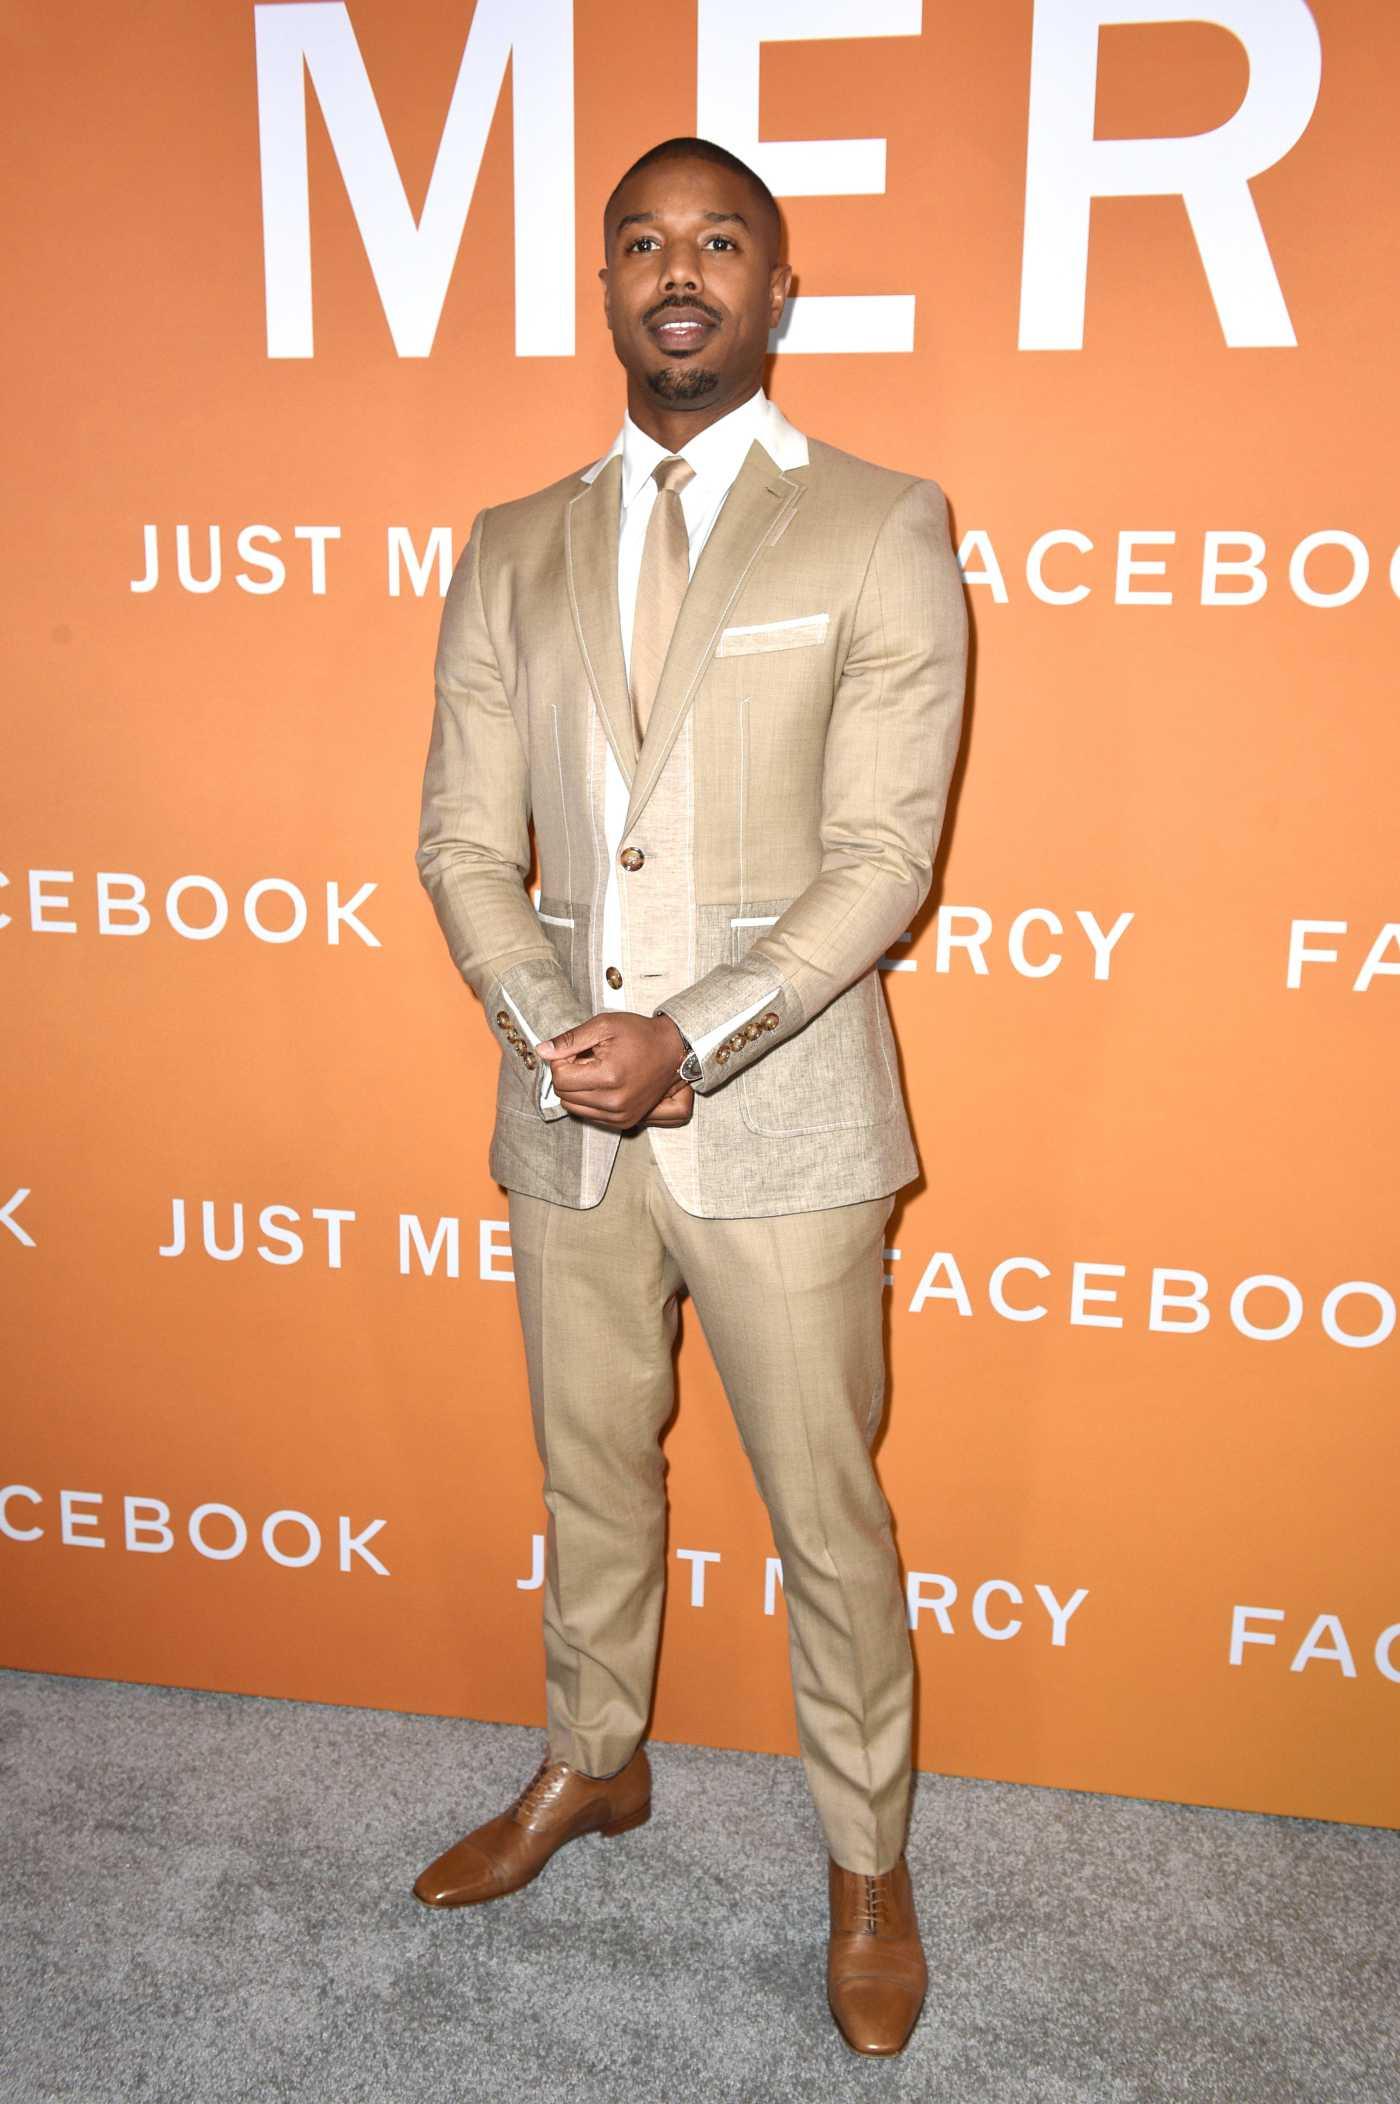 Michael B Jordan Attends Just Mercy Screening in Los Angeles 01/06/2020